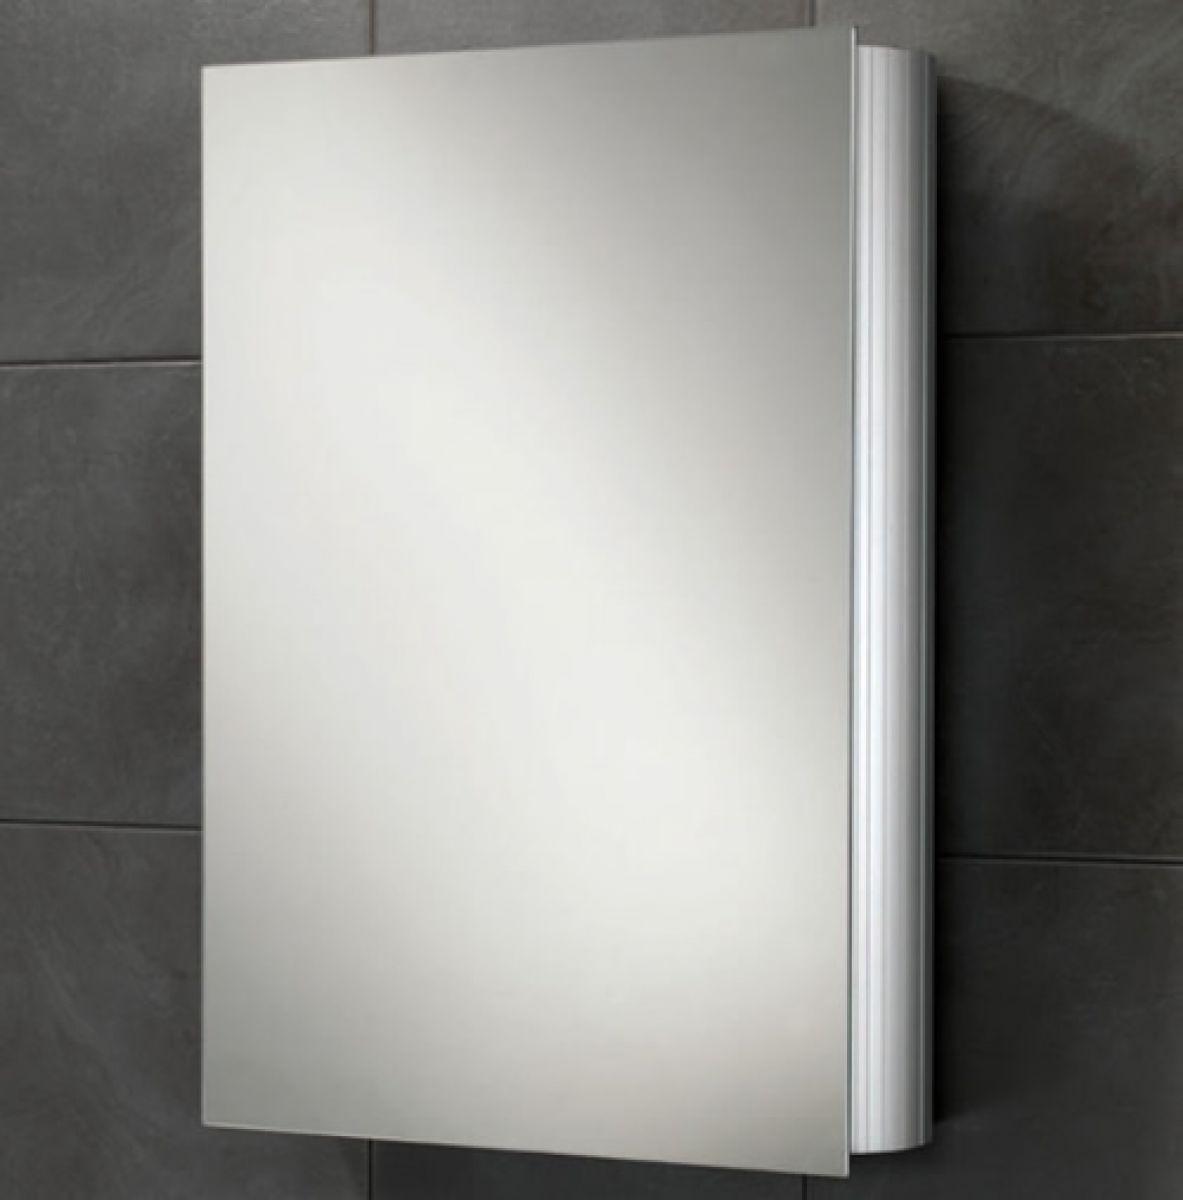 Aluminium Bathroom Cabinets Hib Nitro Aluminium Bathroom Cabinet Uk Bathrooms